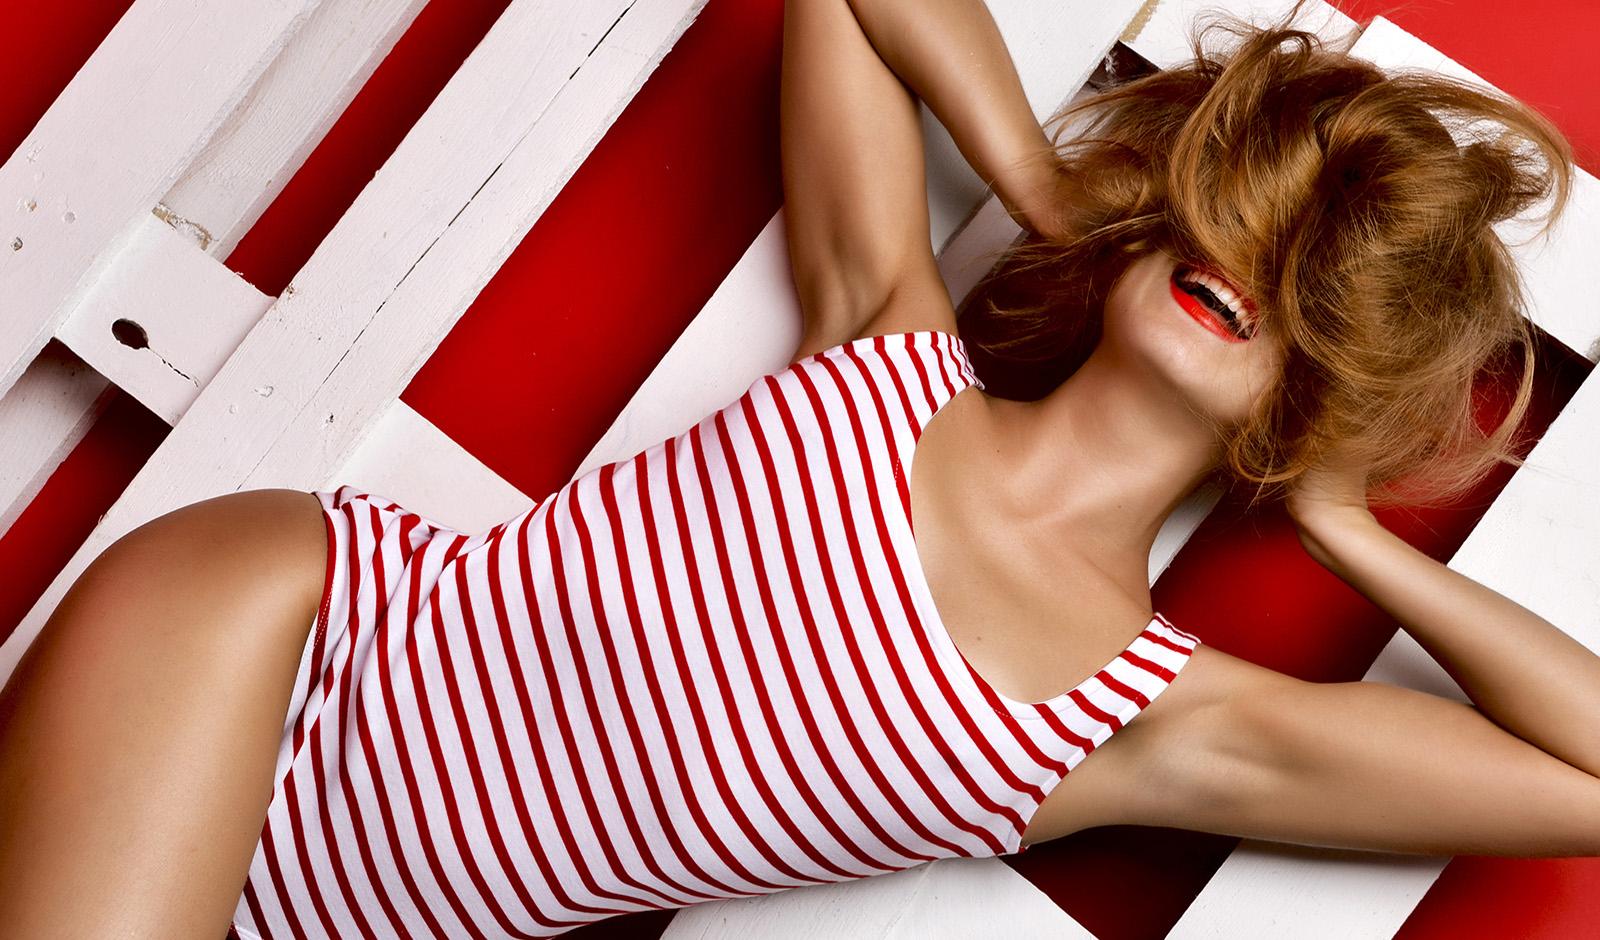 diy-recipes-har-masks-make-hair-grow-cute-woman-in-red-swimsuit-holding-hair.